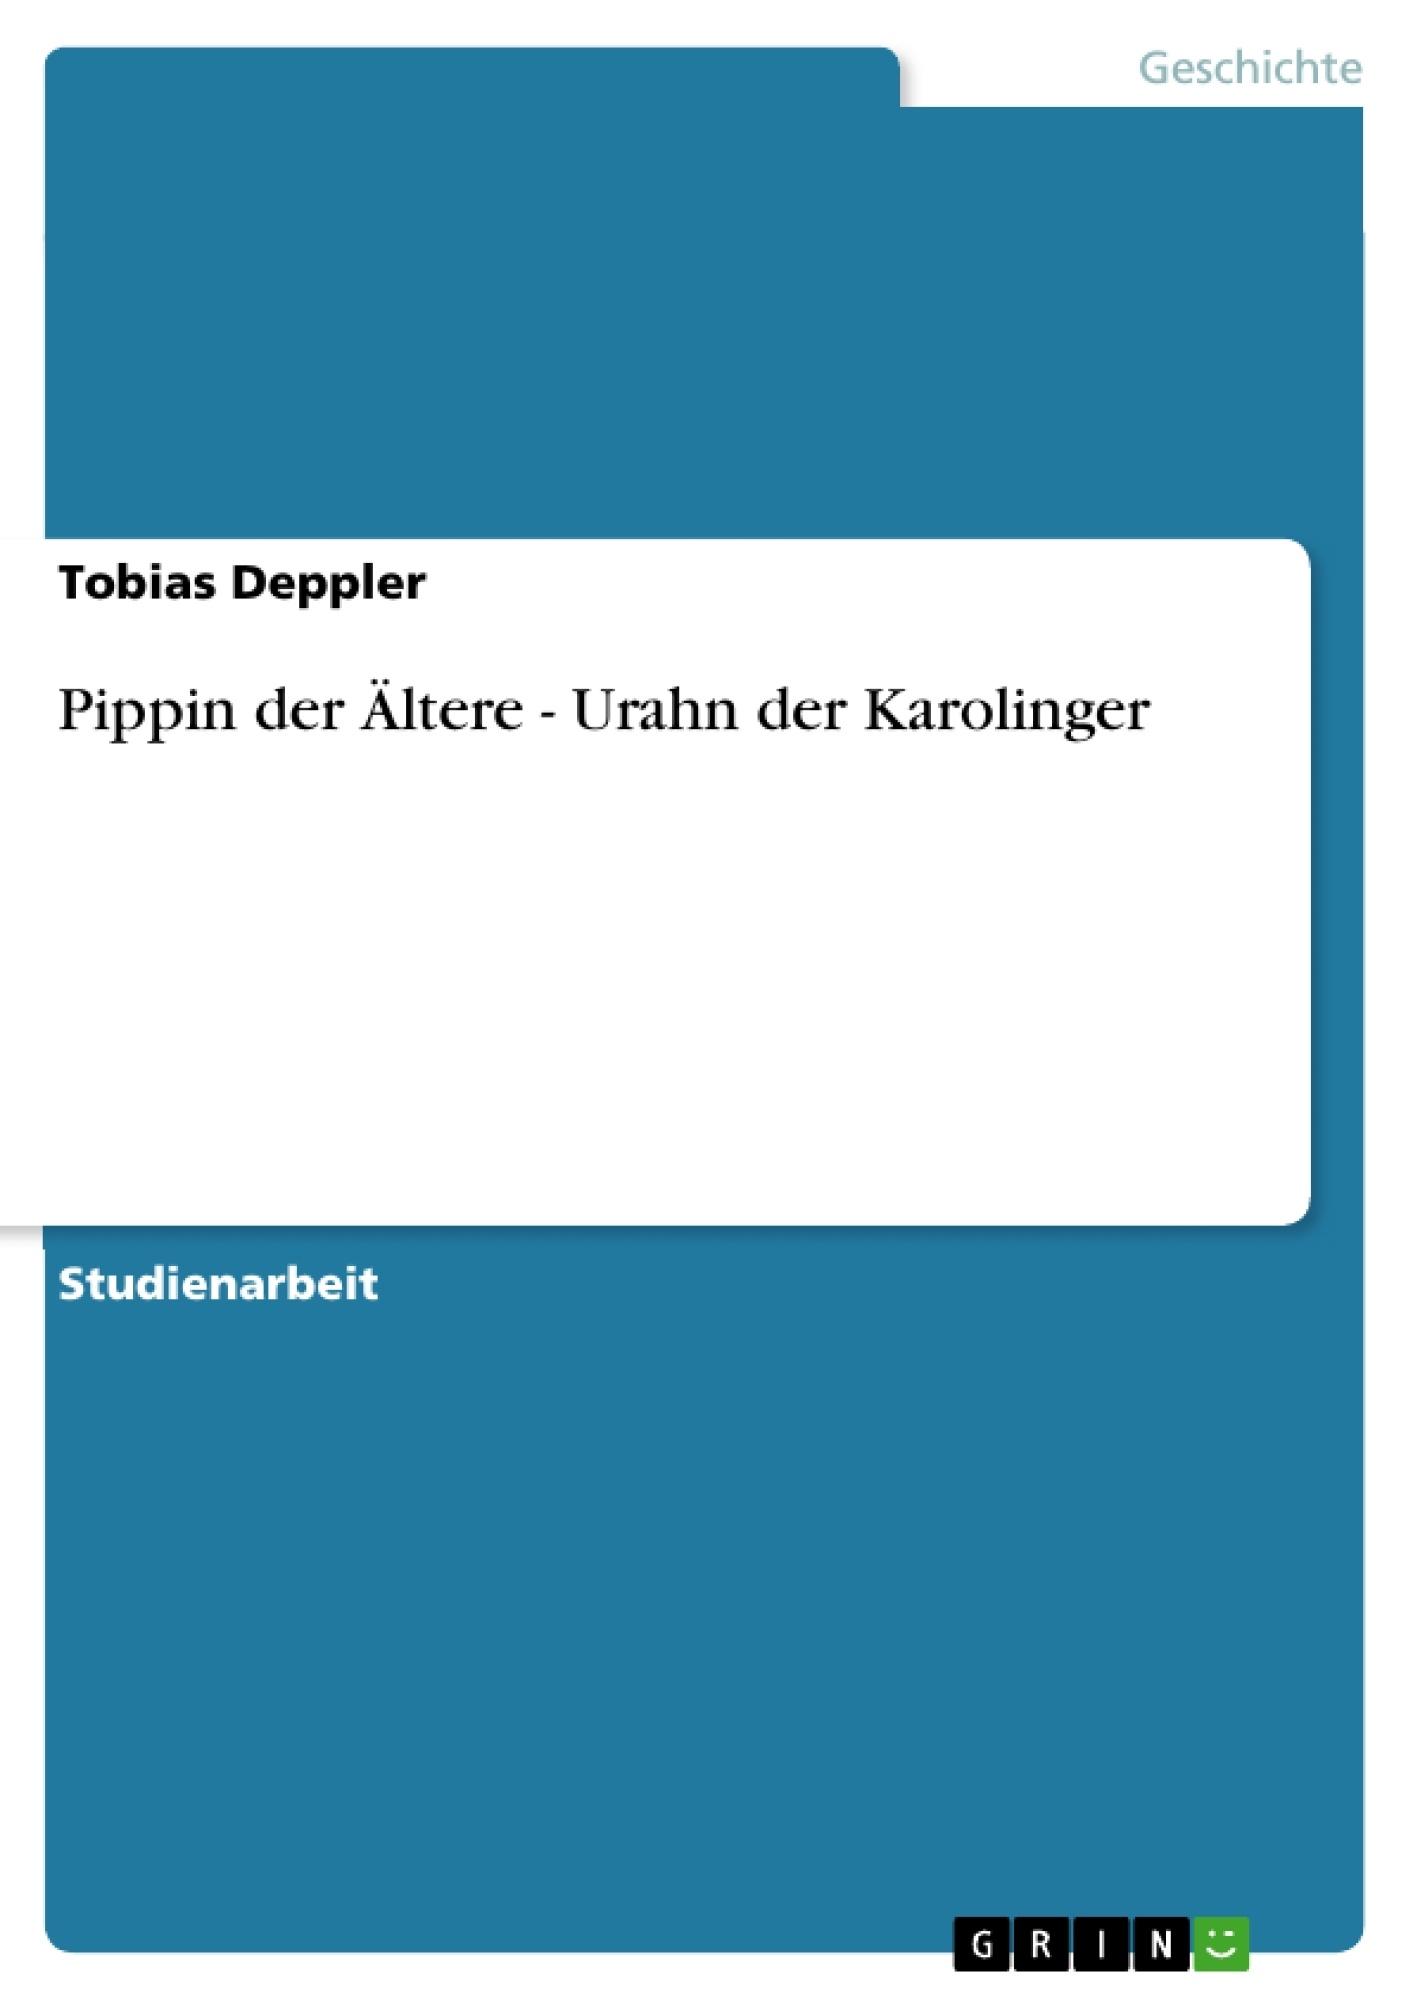 Titel: Pippin der Ältere - Urahn der Karolinger